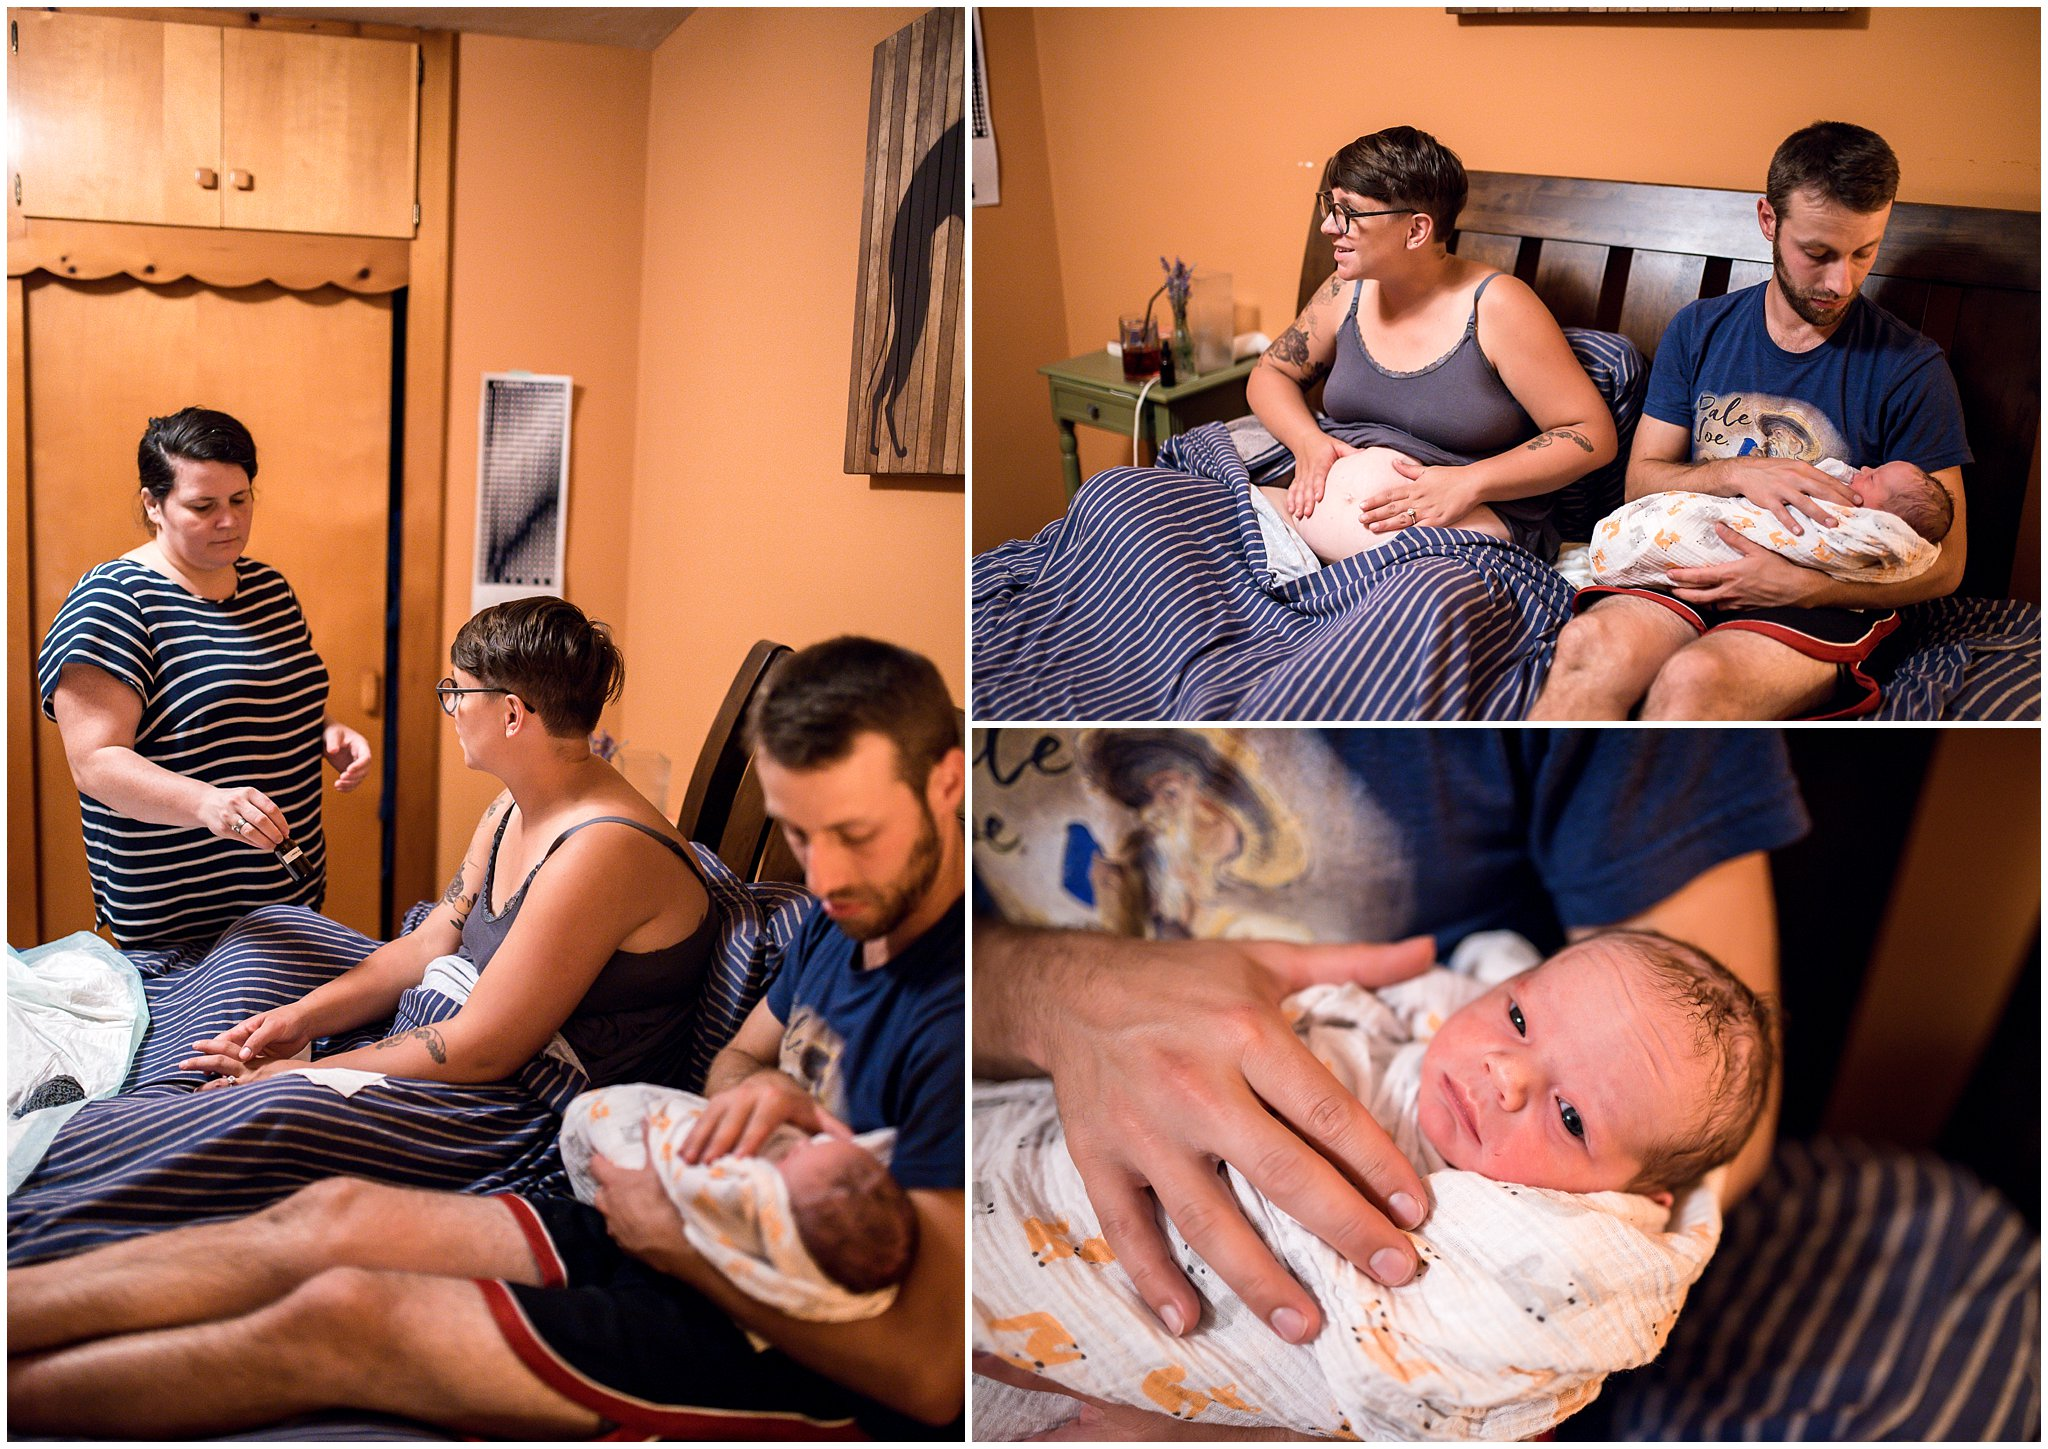 Grand Rapids home birth photographer - Annica Quakenbush - ready to rest